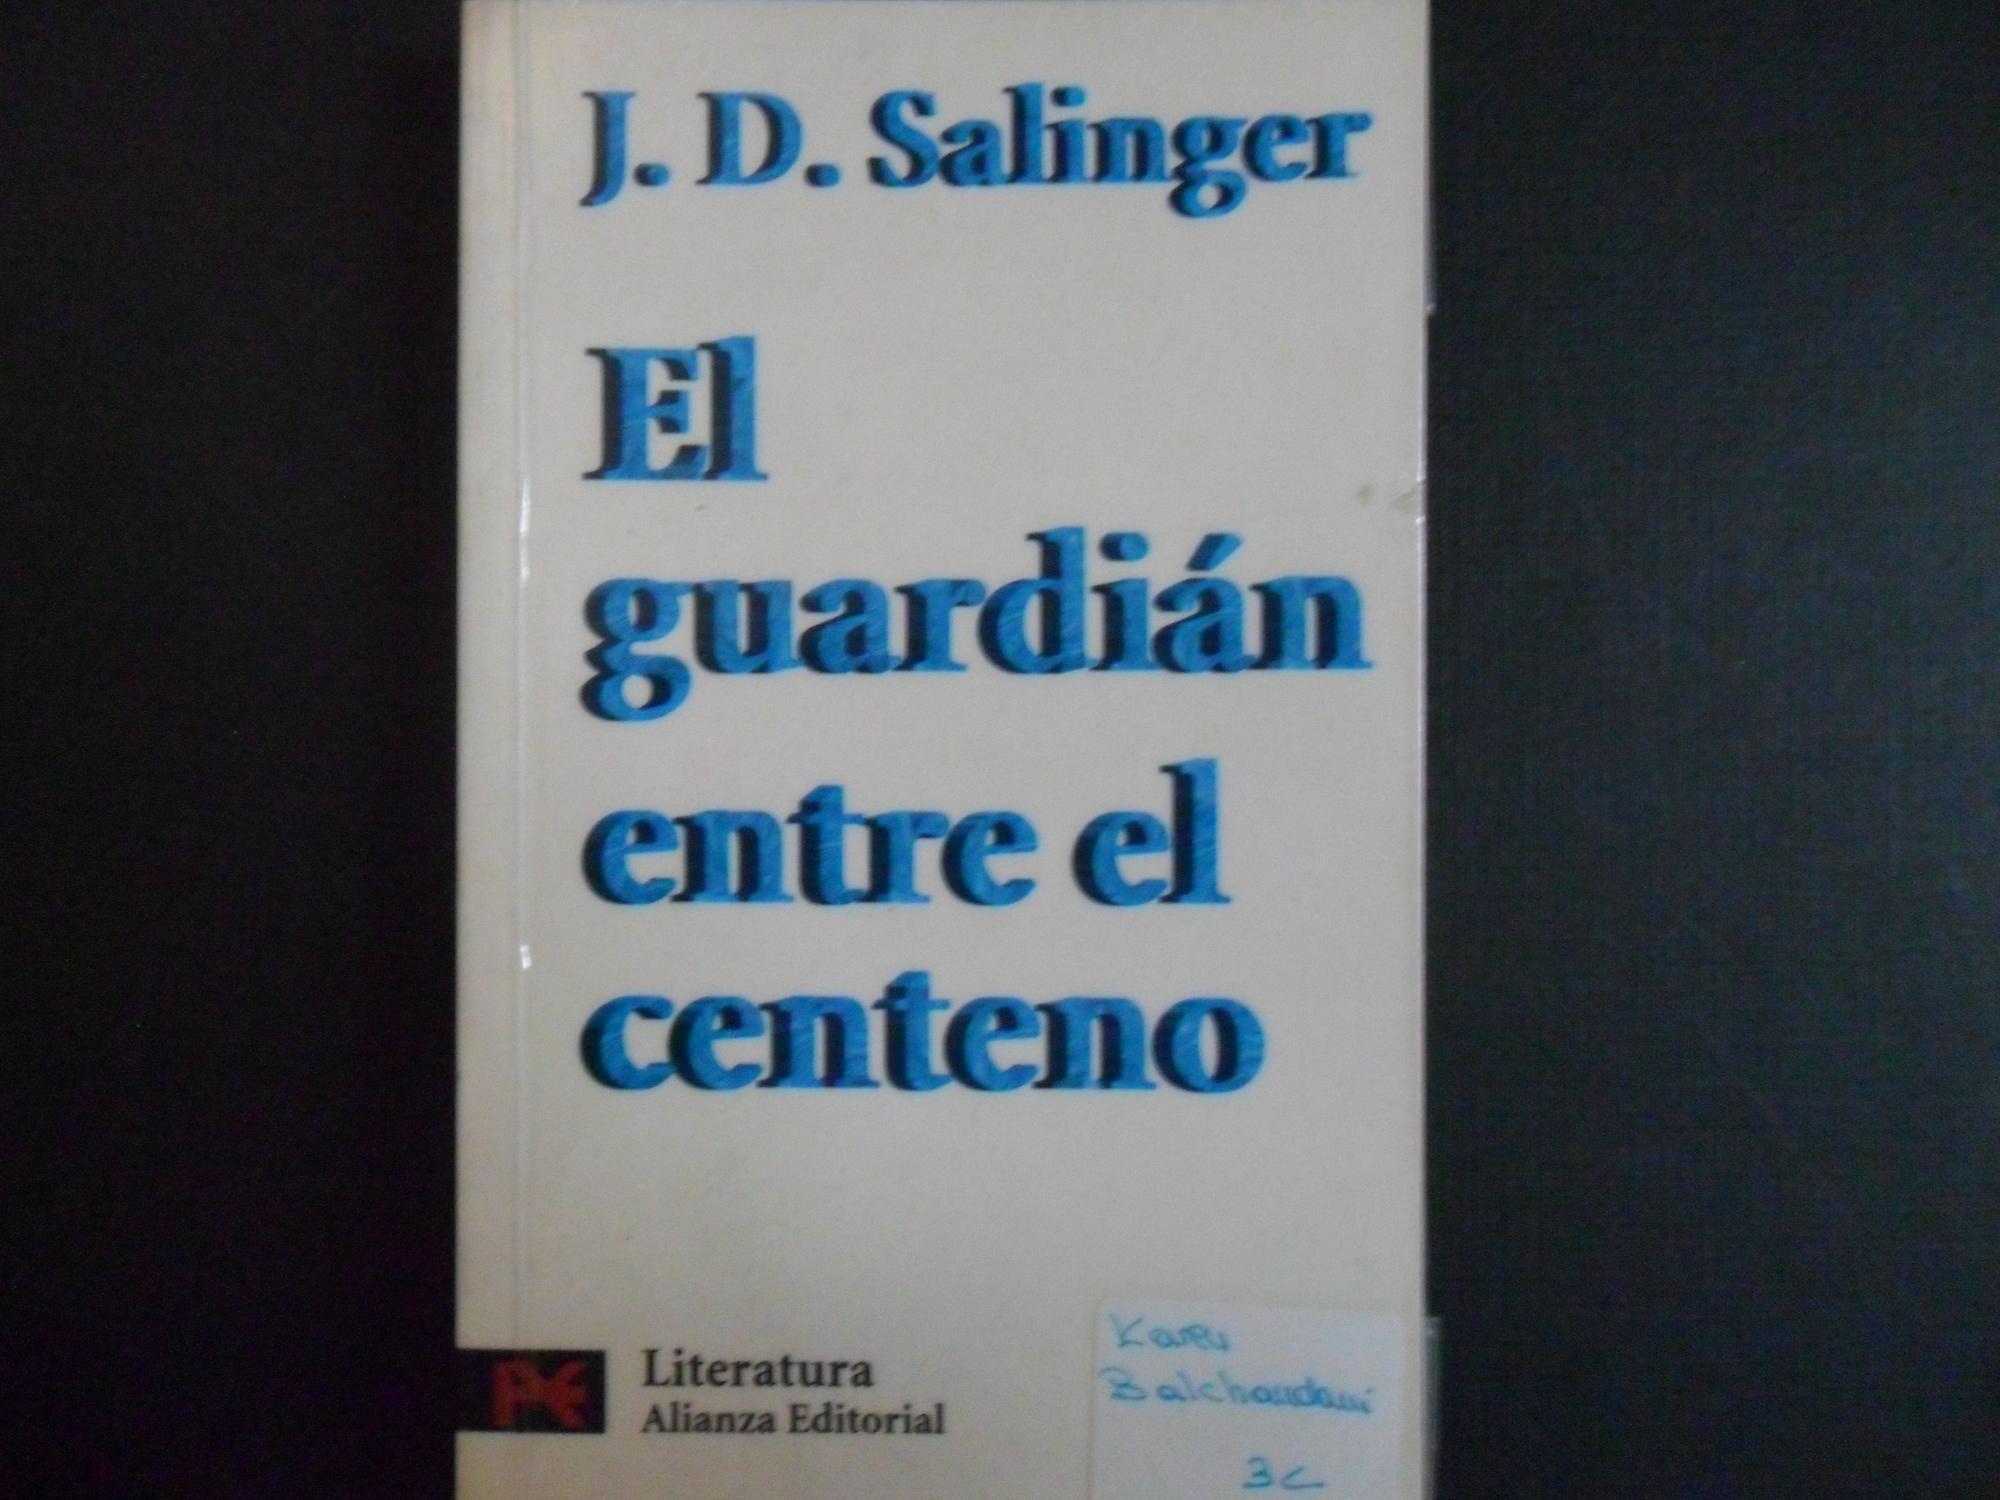 EL GUARDIAN ENTRE EL CENTENO: SALINGER